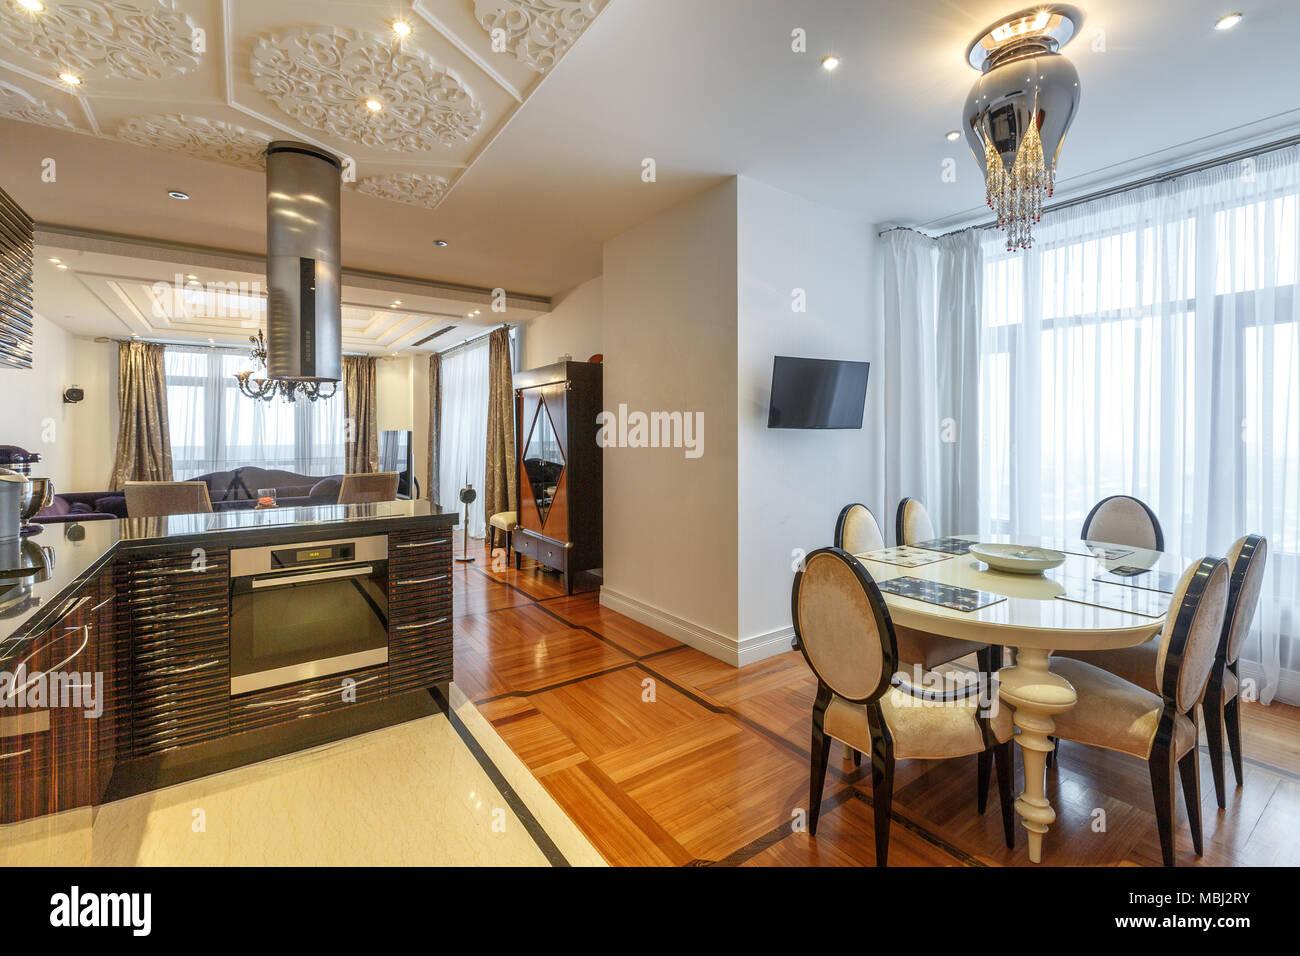 Luxus Esszimmer Innenraum Stockfoto Bild 179262271 Alamy